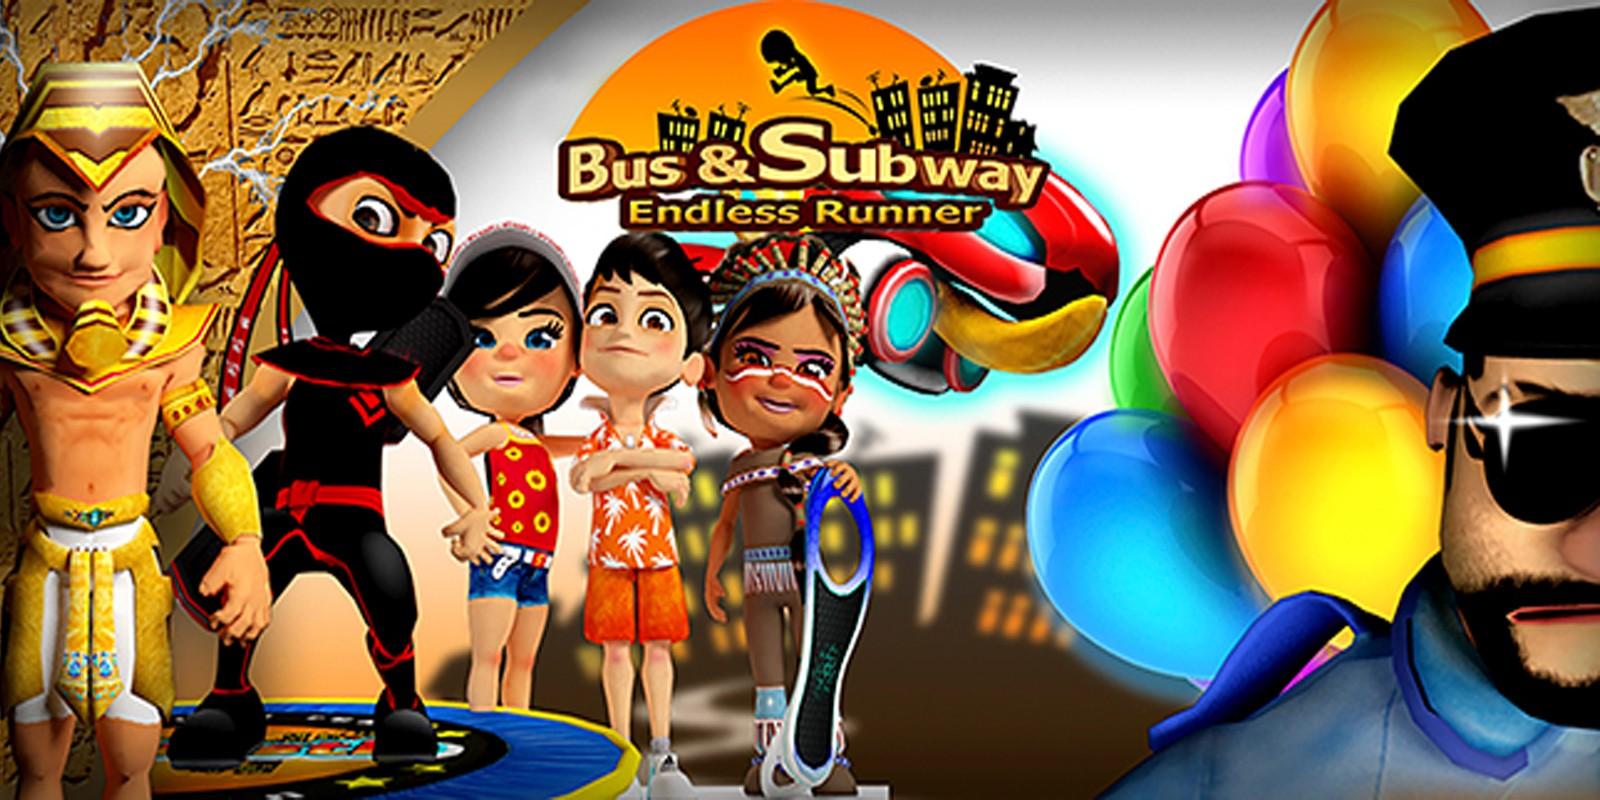 Bus AndSubway Endless Runner Unity